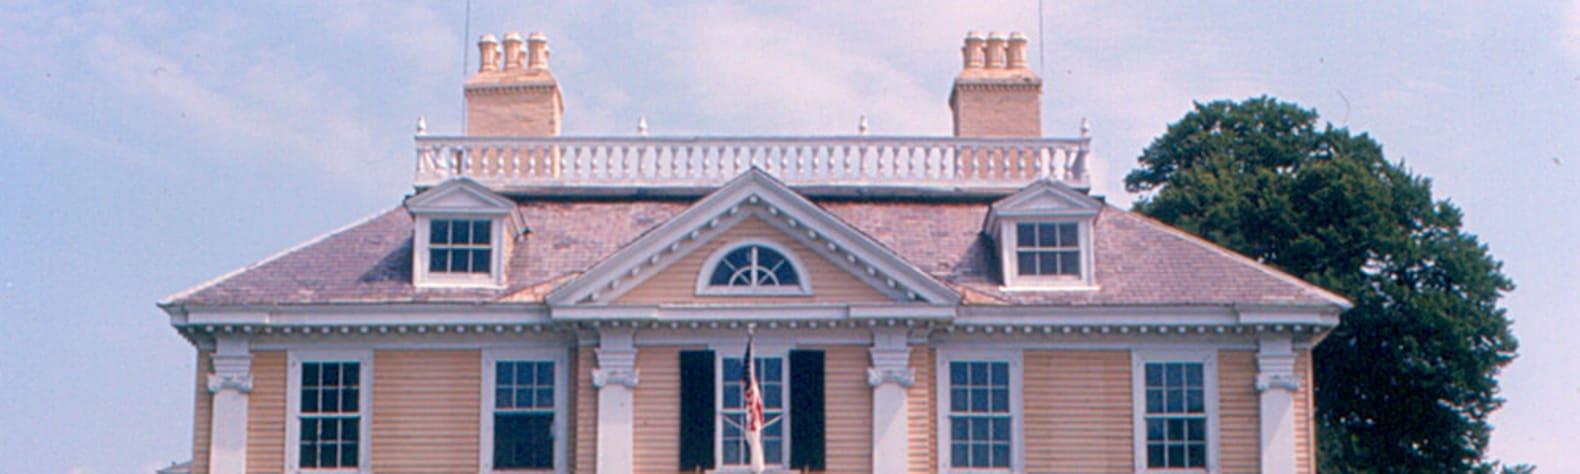 Longfellow House Washington's Headquarters National Historic Site